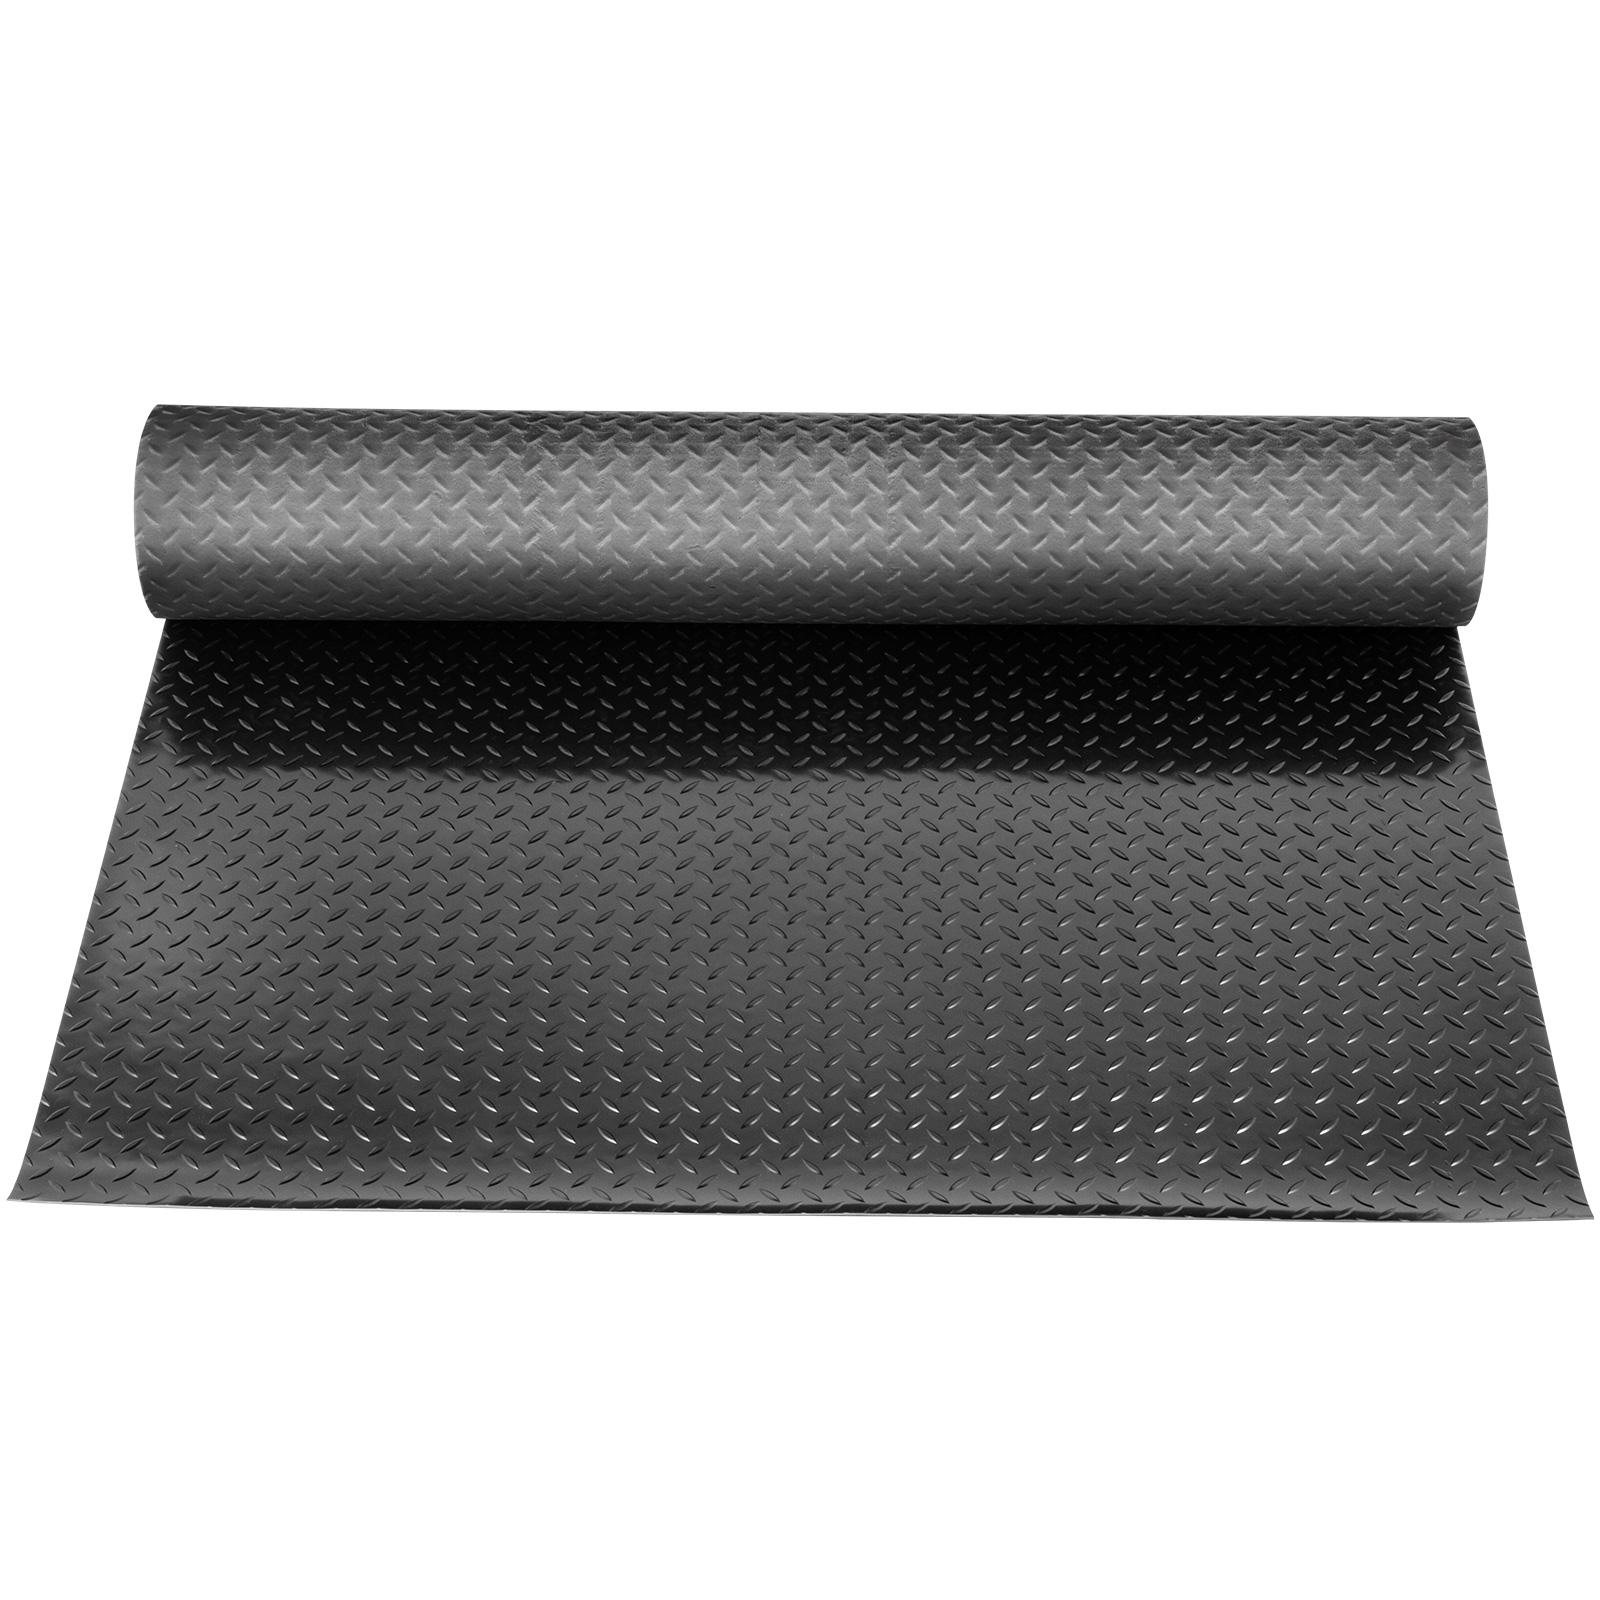 thumbnail 84 - Garage Flooring Mat Roll Car Trailer Floor Covering 1.1m Width Gym Floor Roll